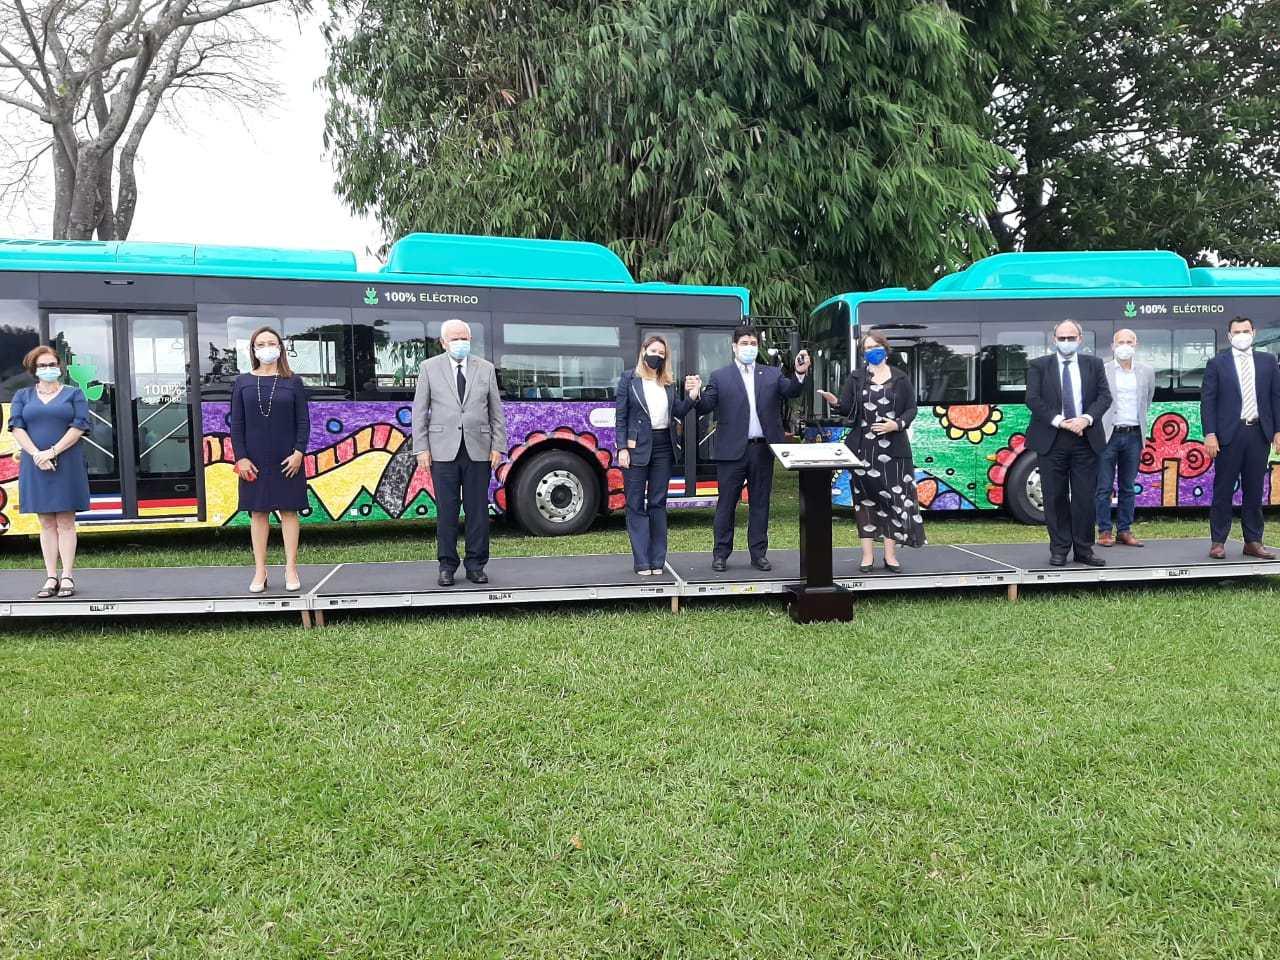 Costa Rica inaugura ruta para probar buses eléctricos San José. Prensa Latina